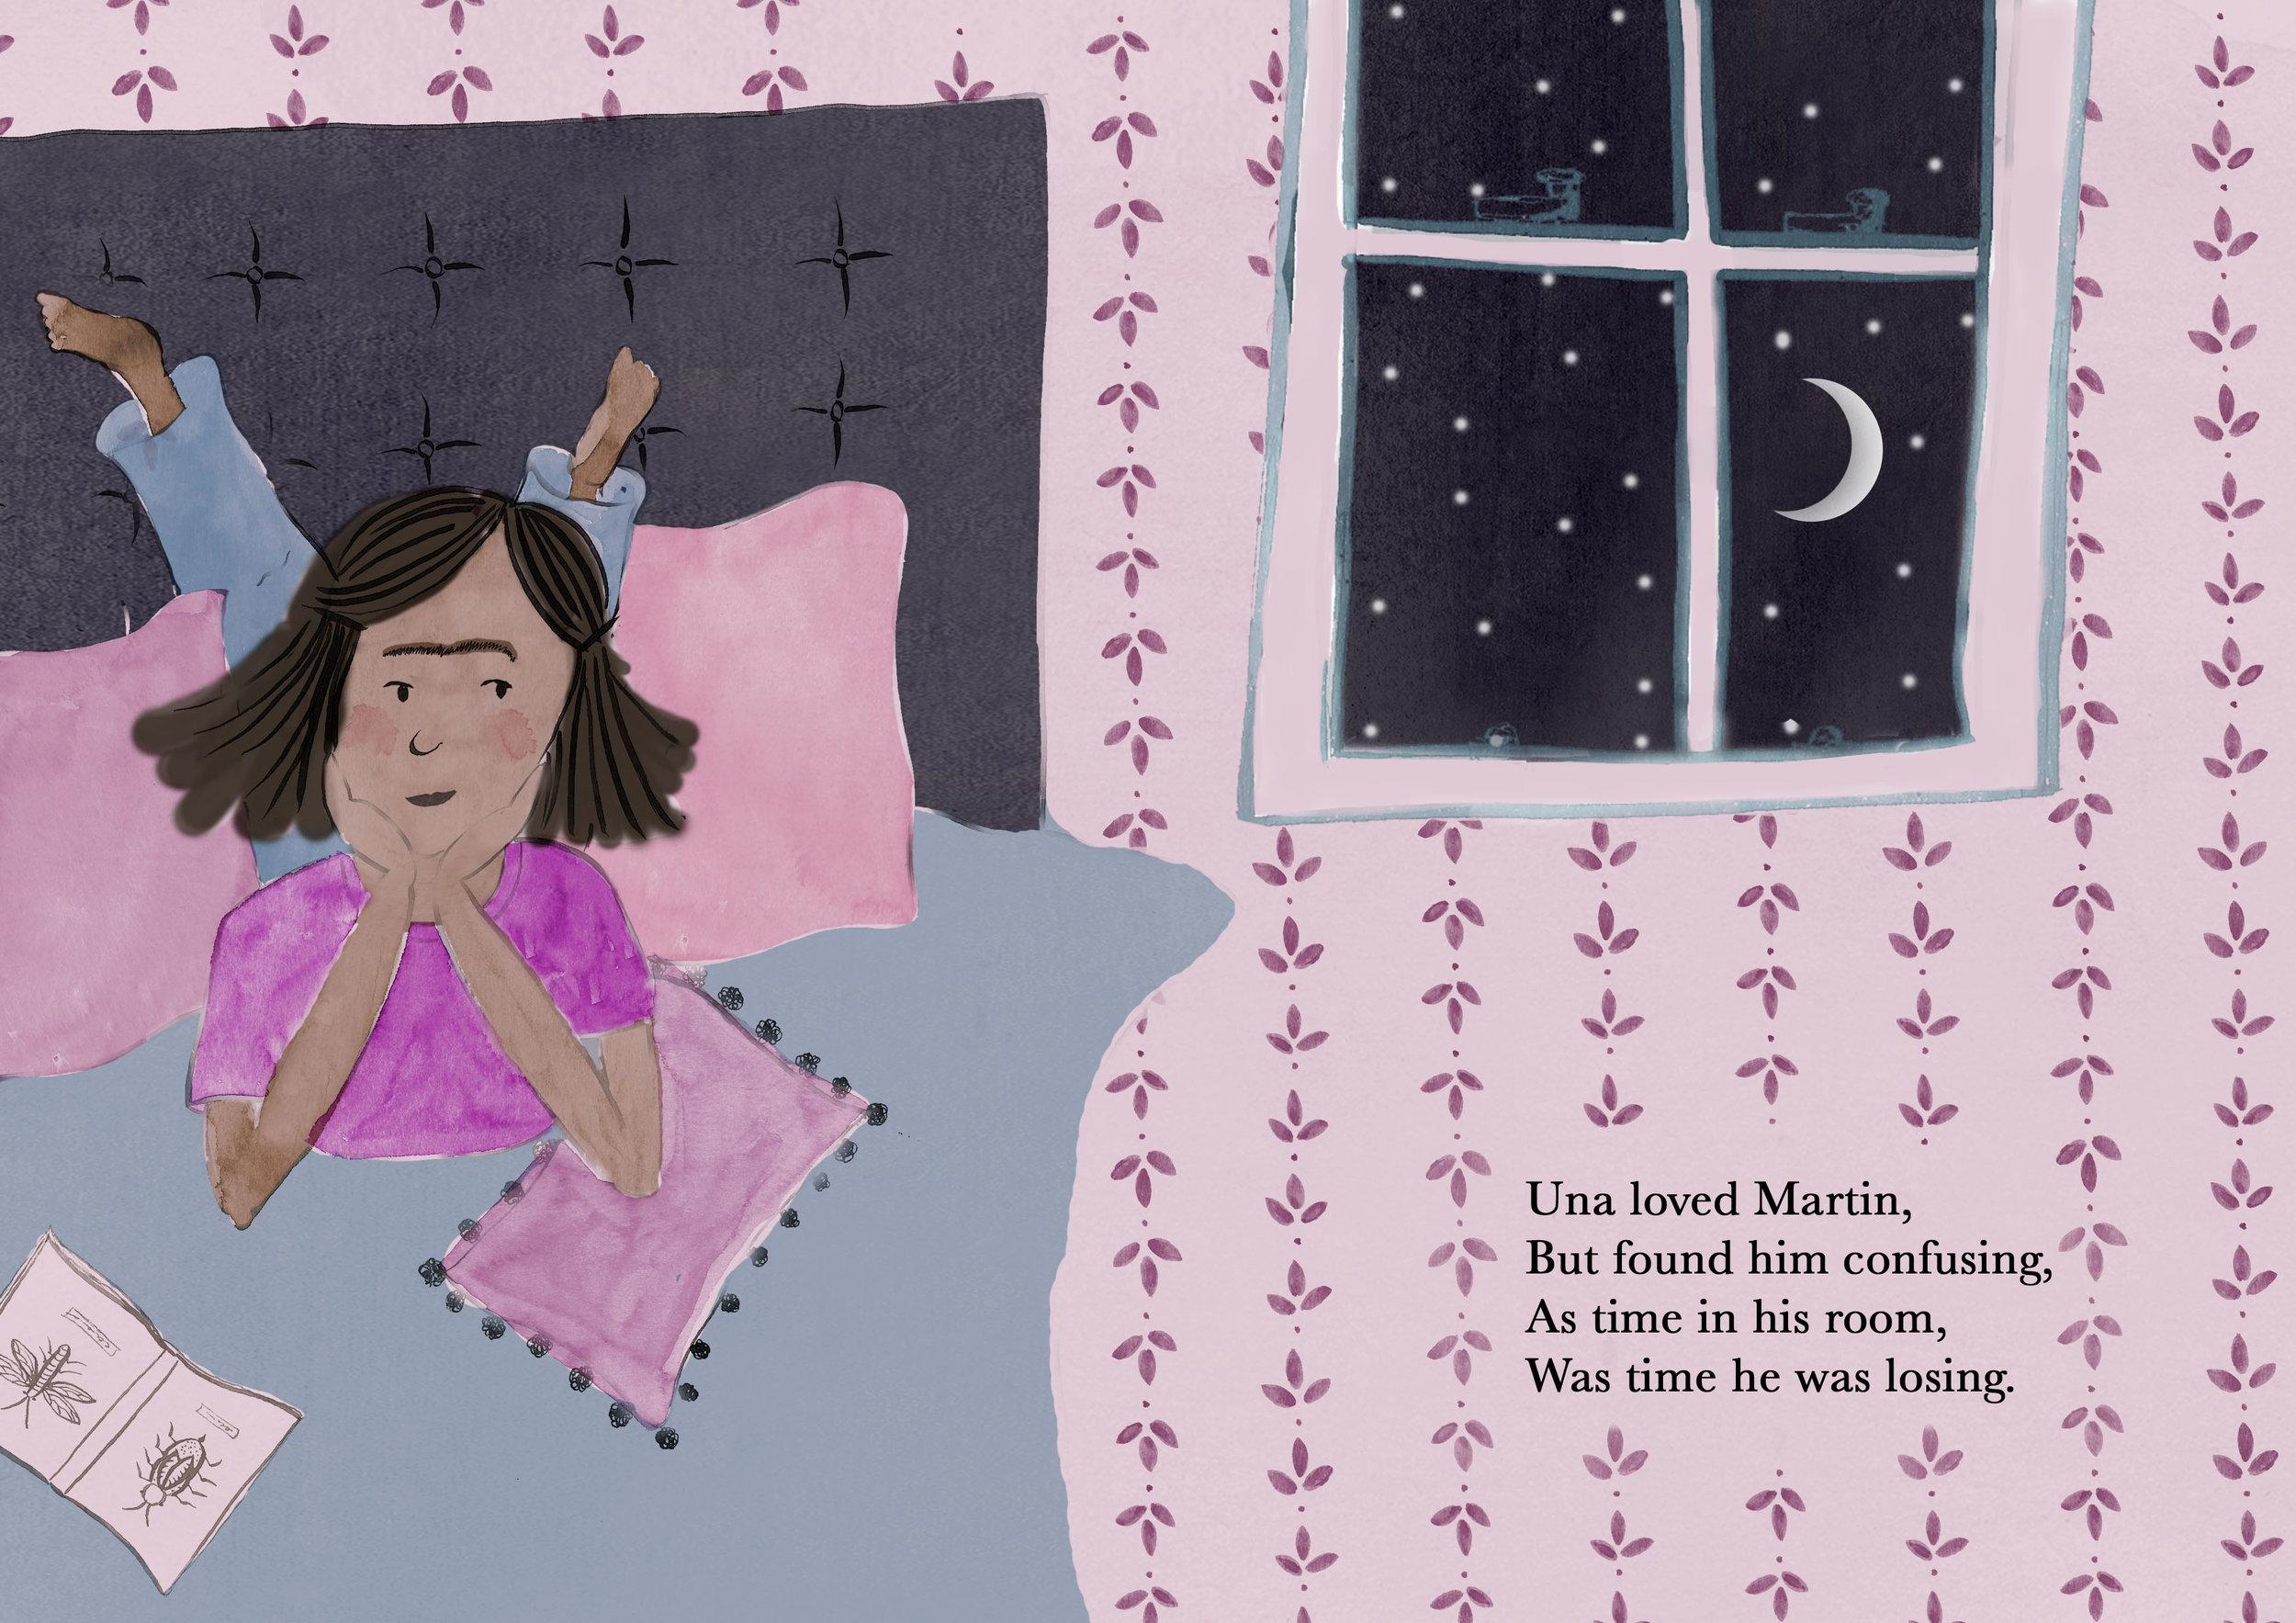 11.MARTIN SIDE-PARTINS_Una's Bedroom_E.jpg